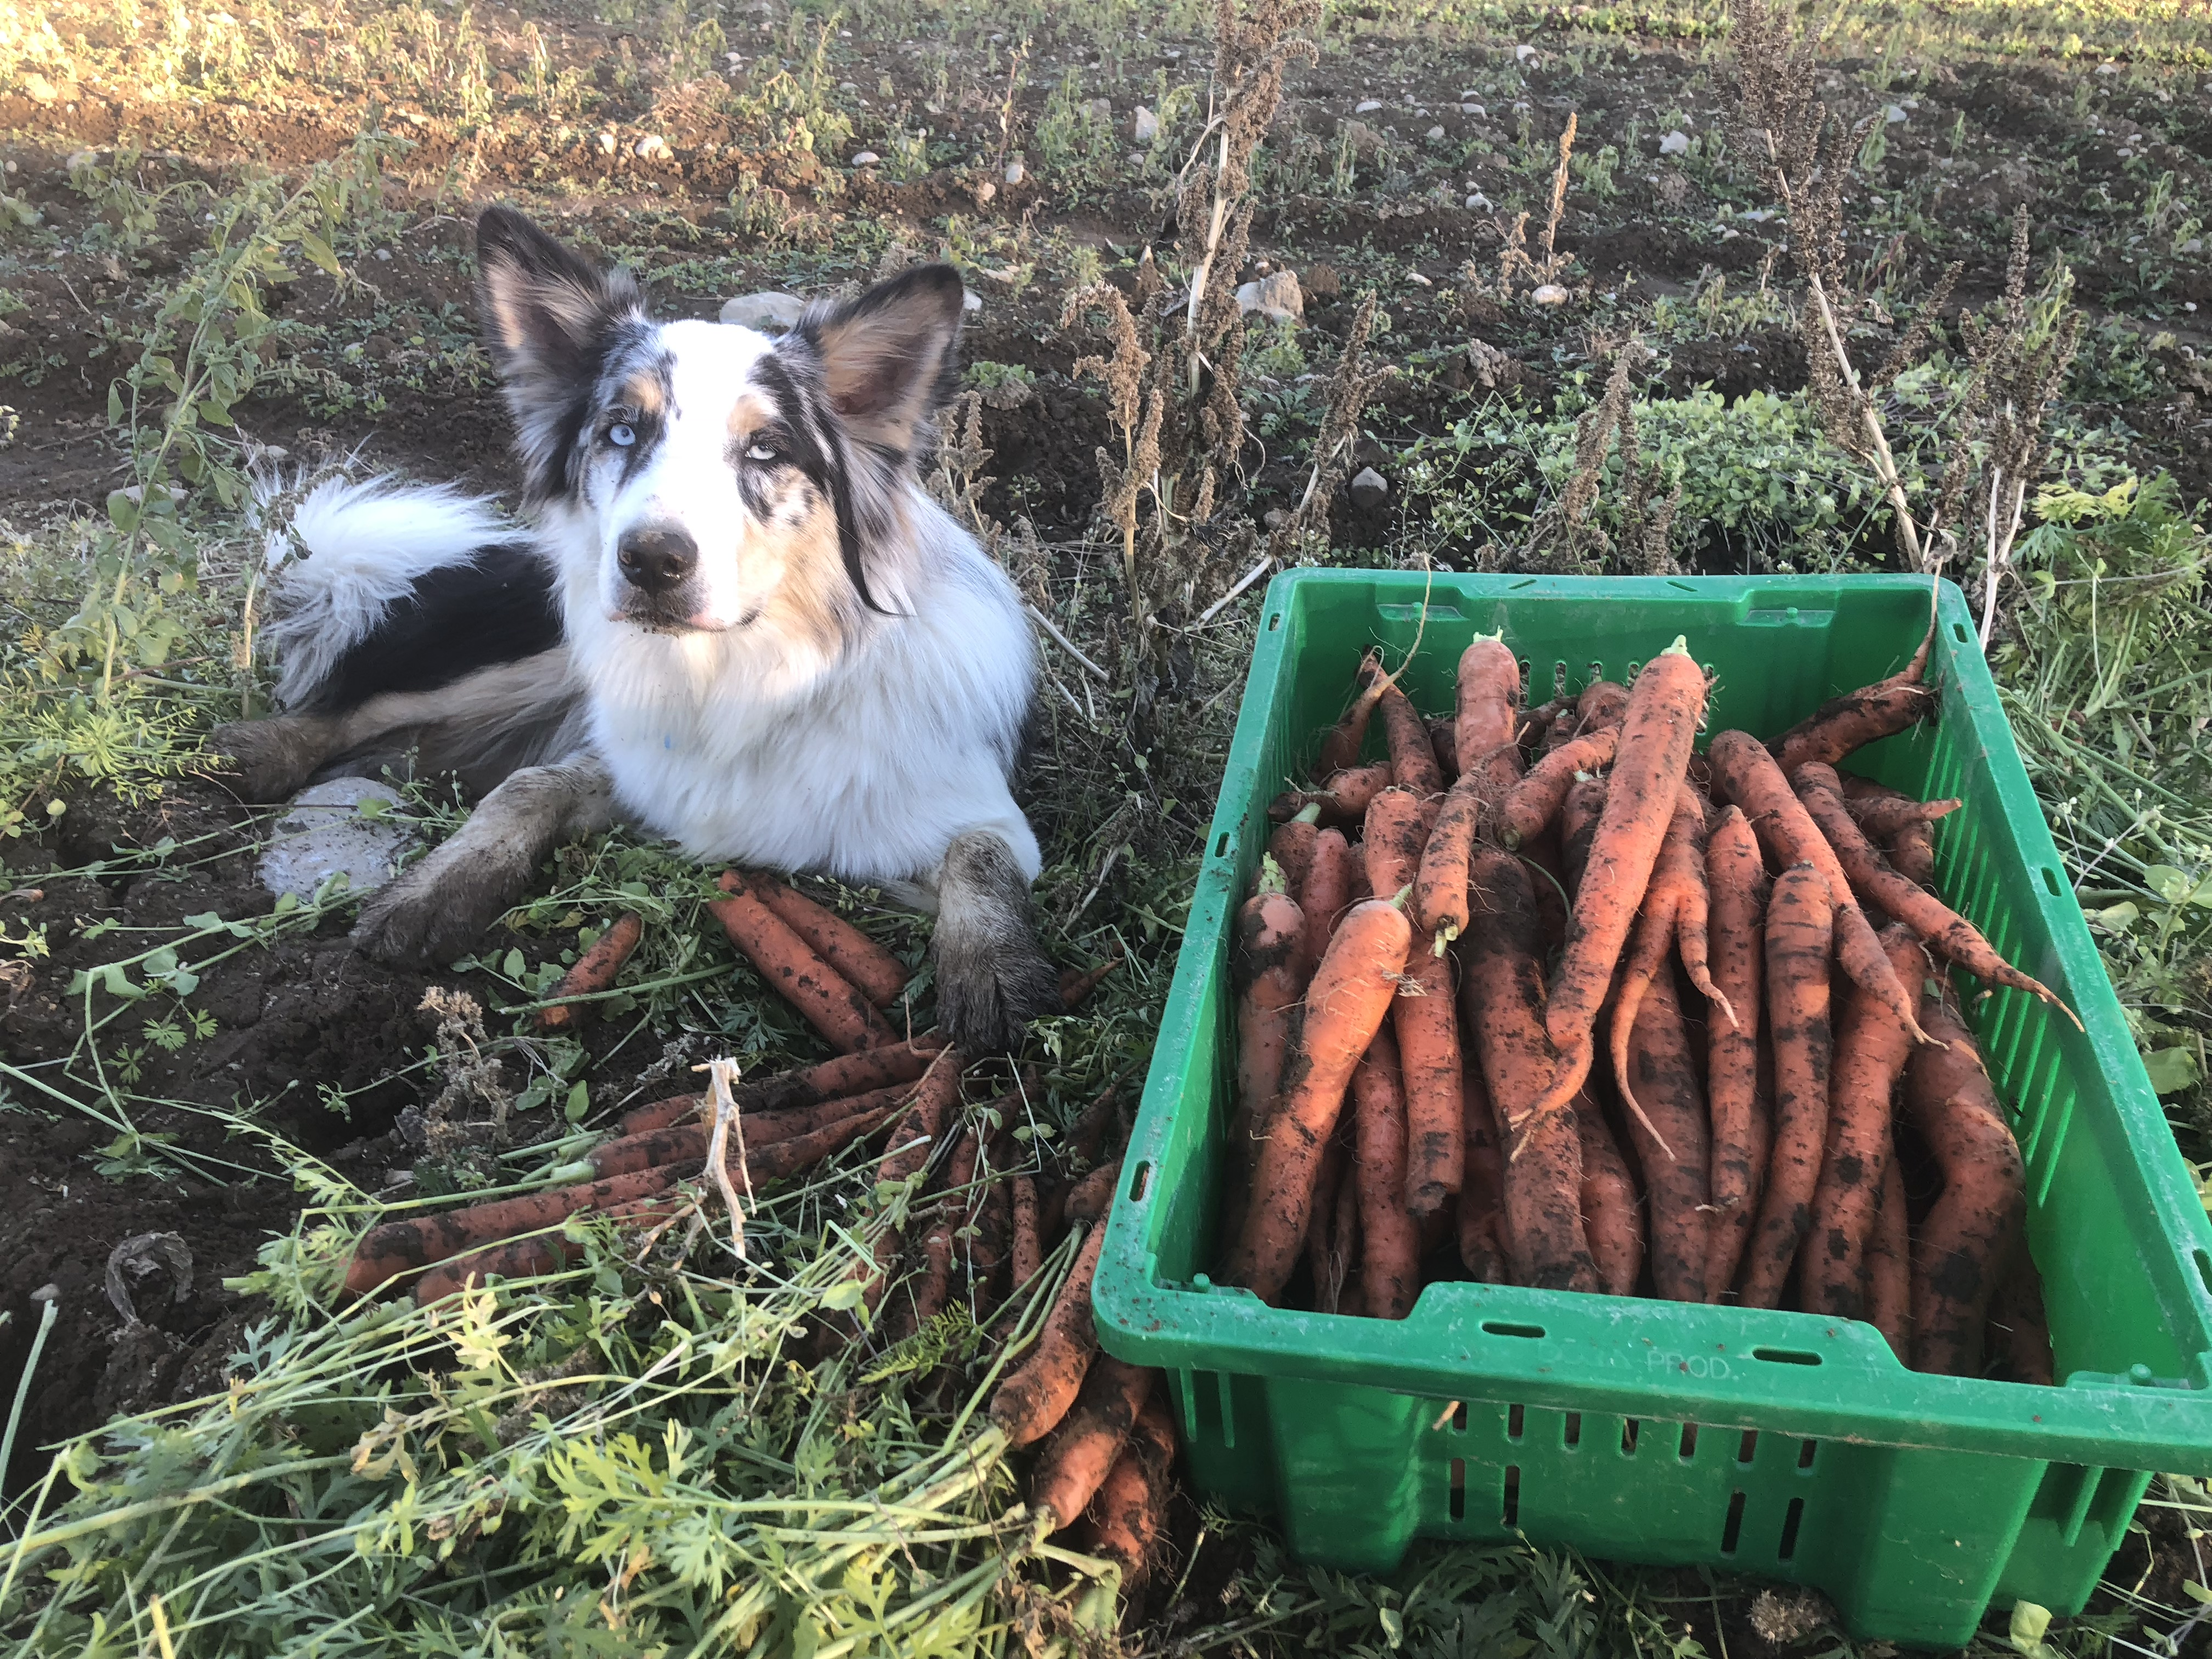 Tuck & Carrots